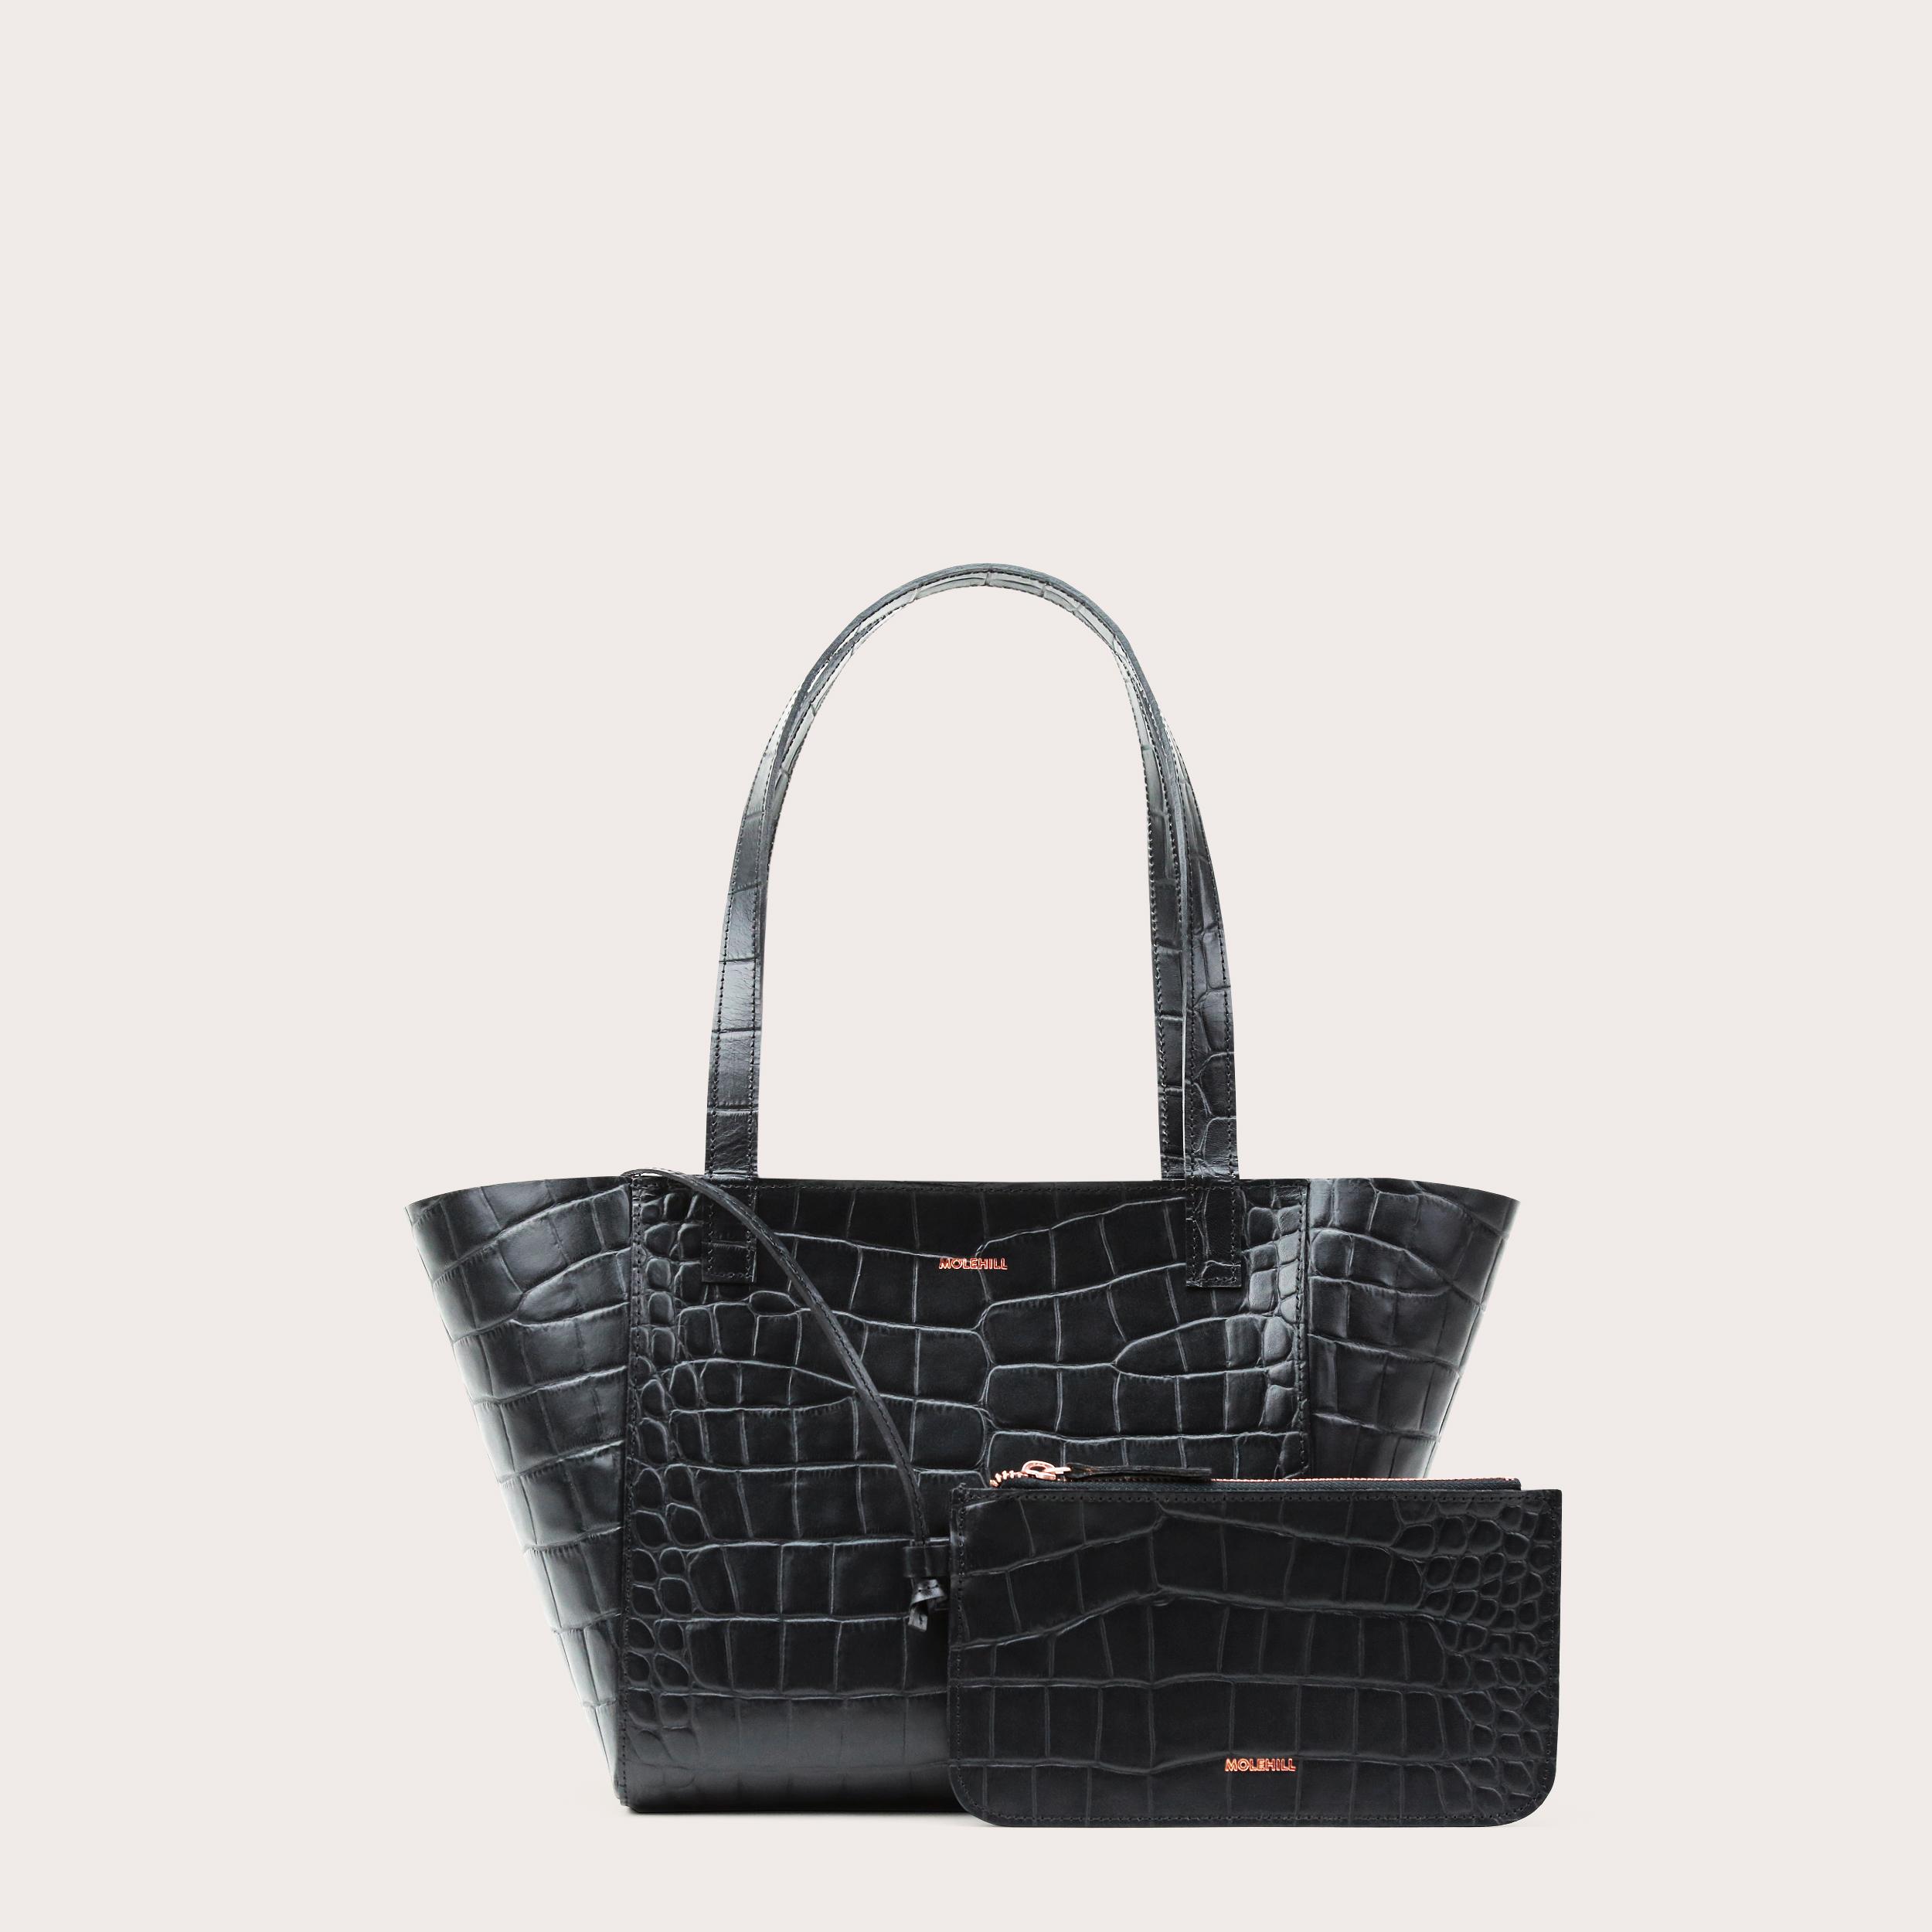 Torba ESTE Regular Zip Shopper Bag Croco Black 2-2